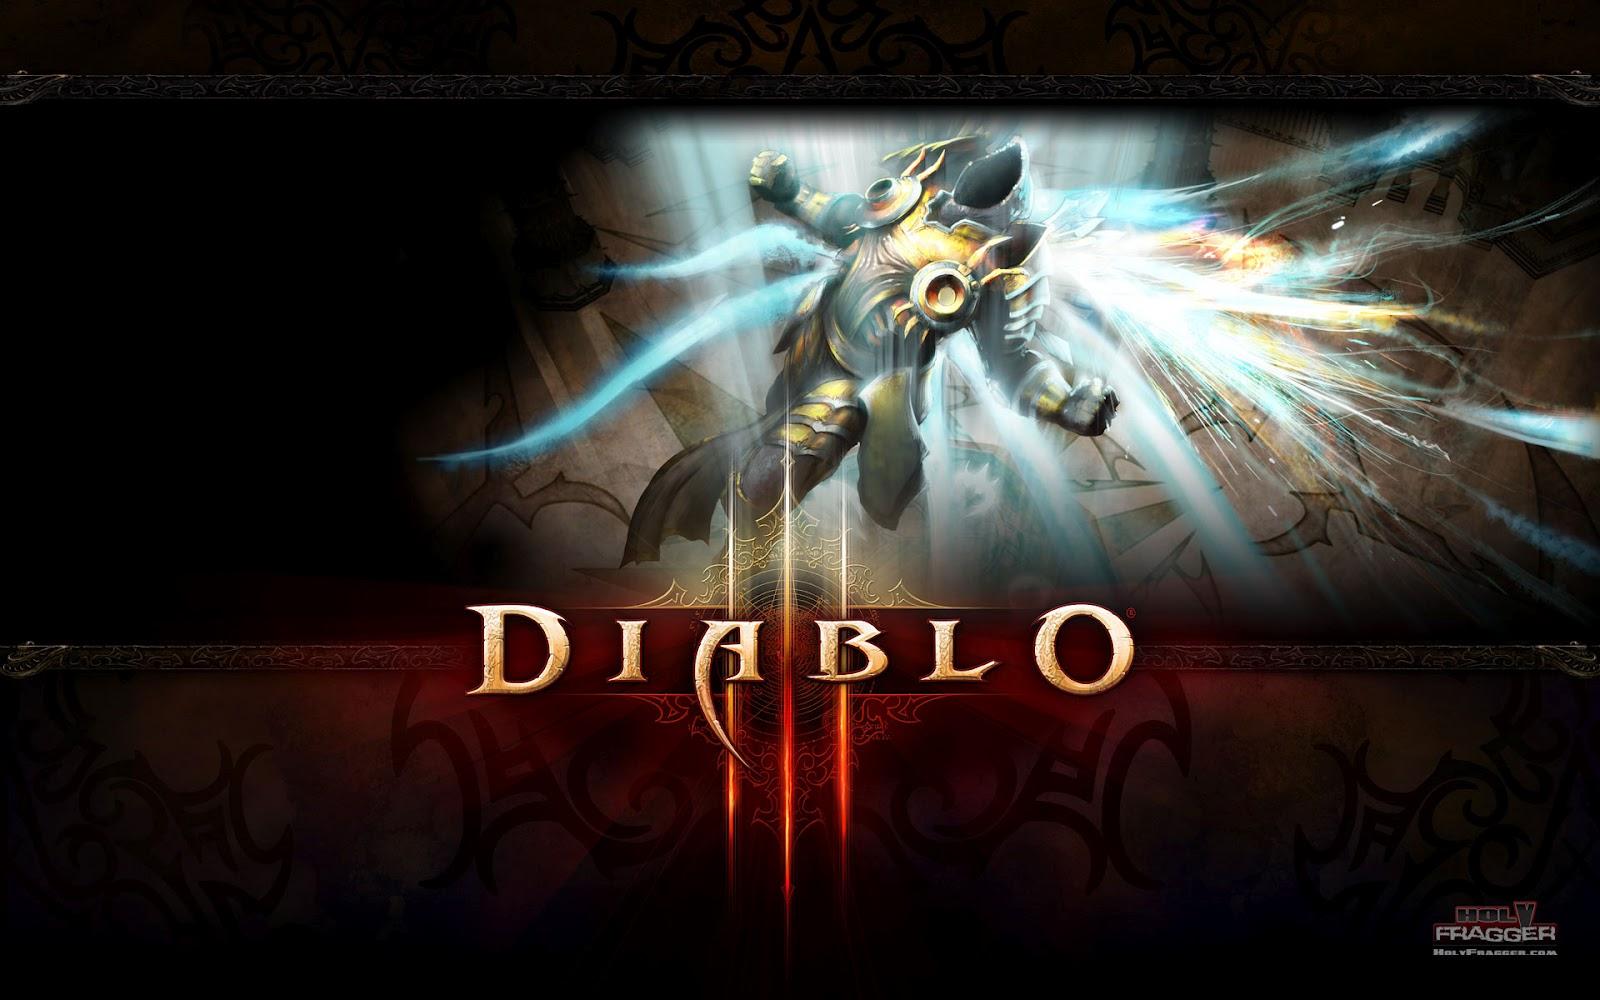 50 diablo 3 character hd wallpaper beautiful games